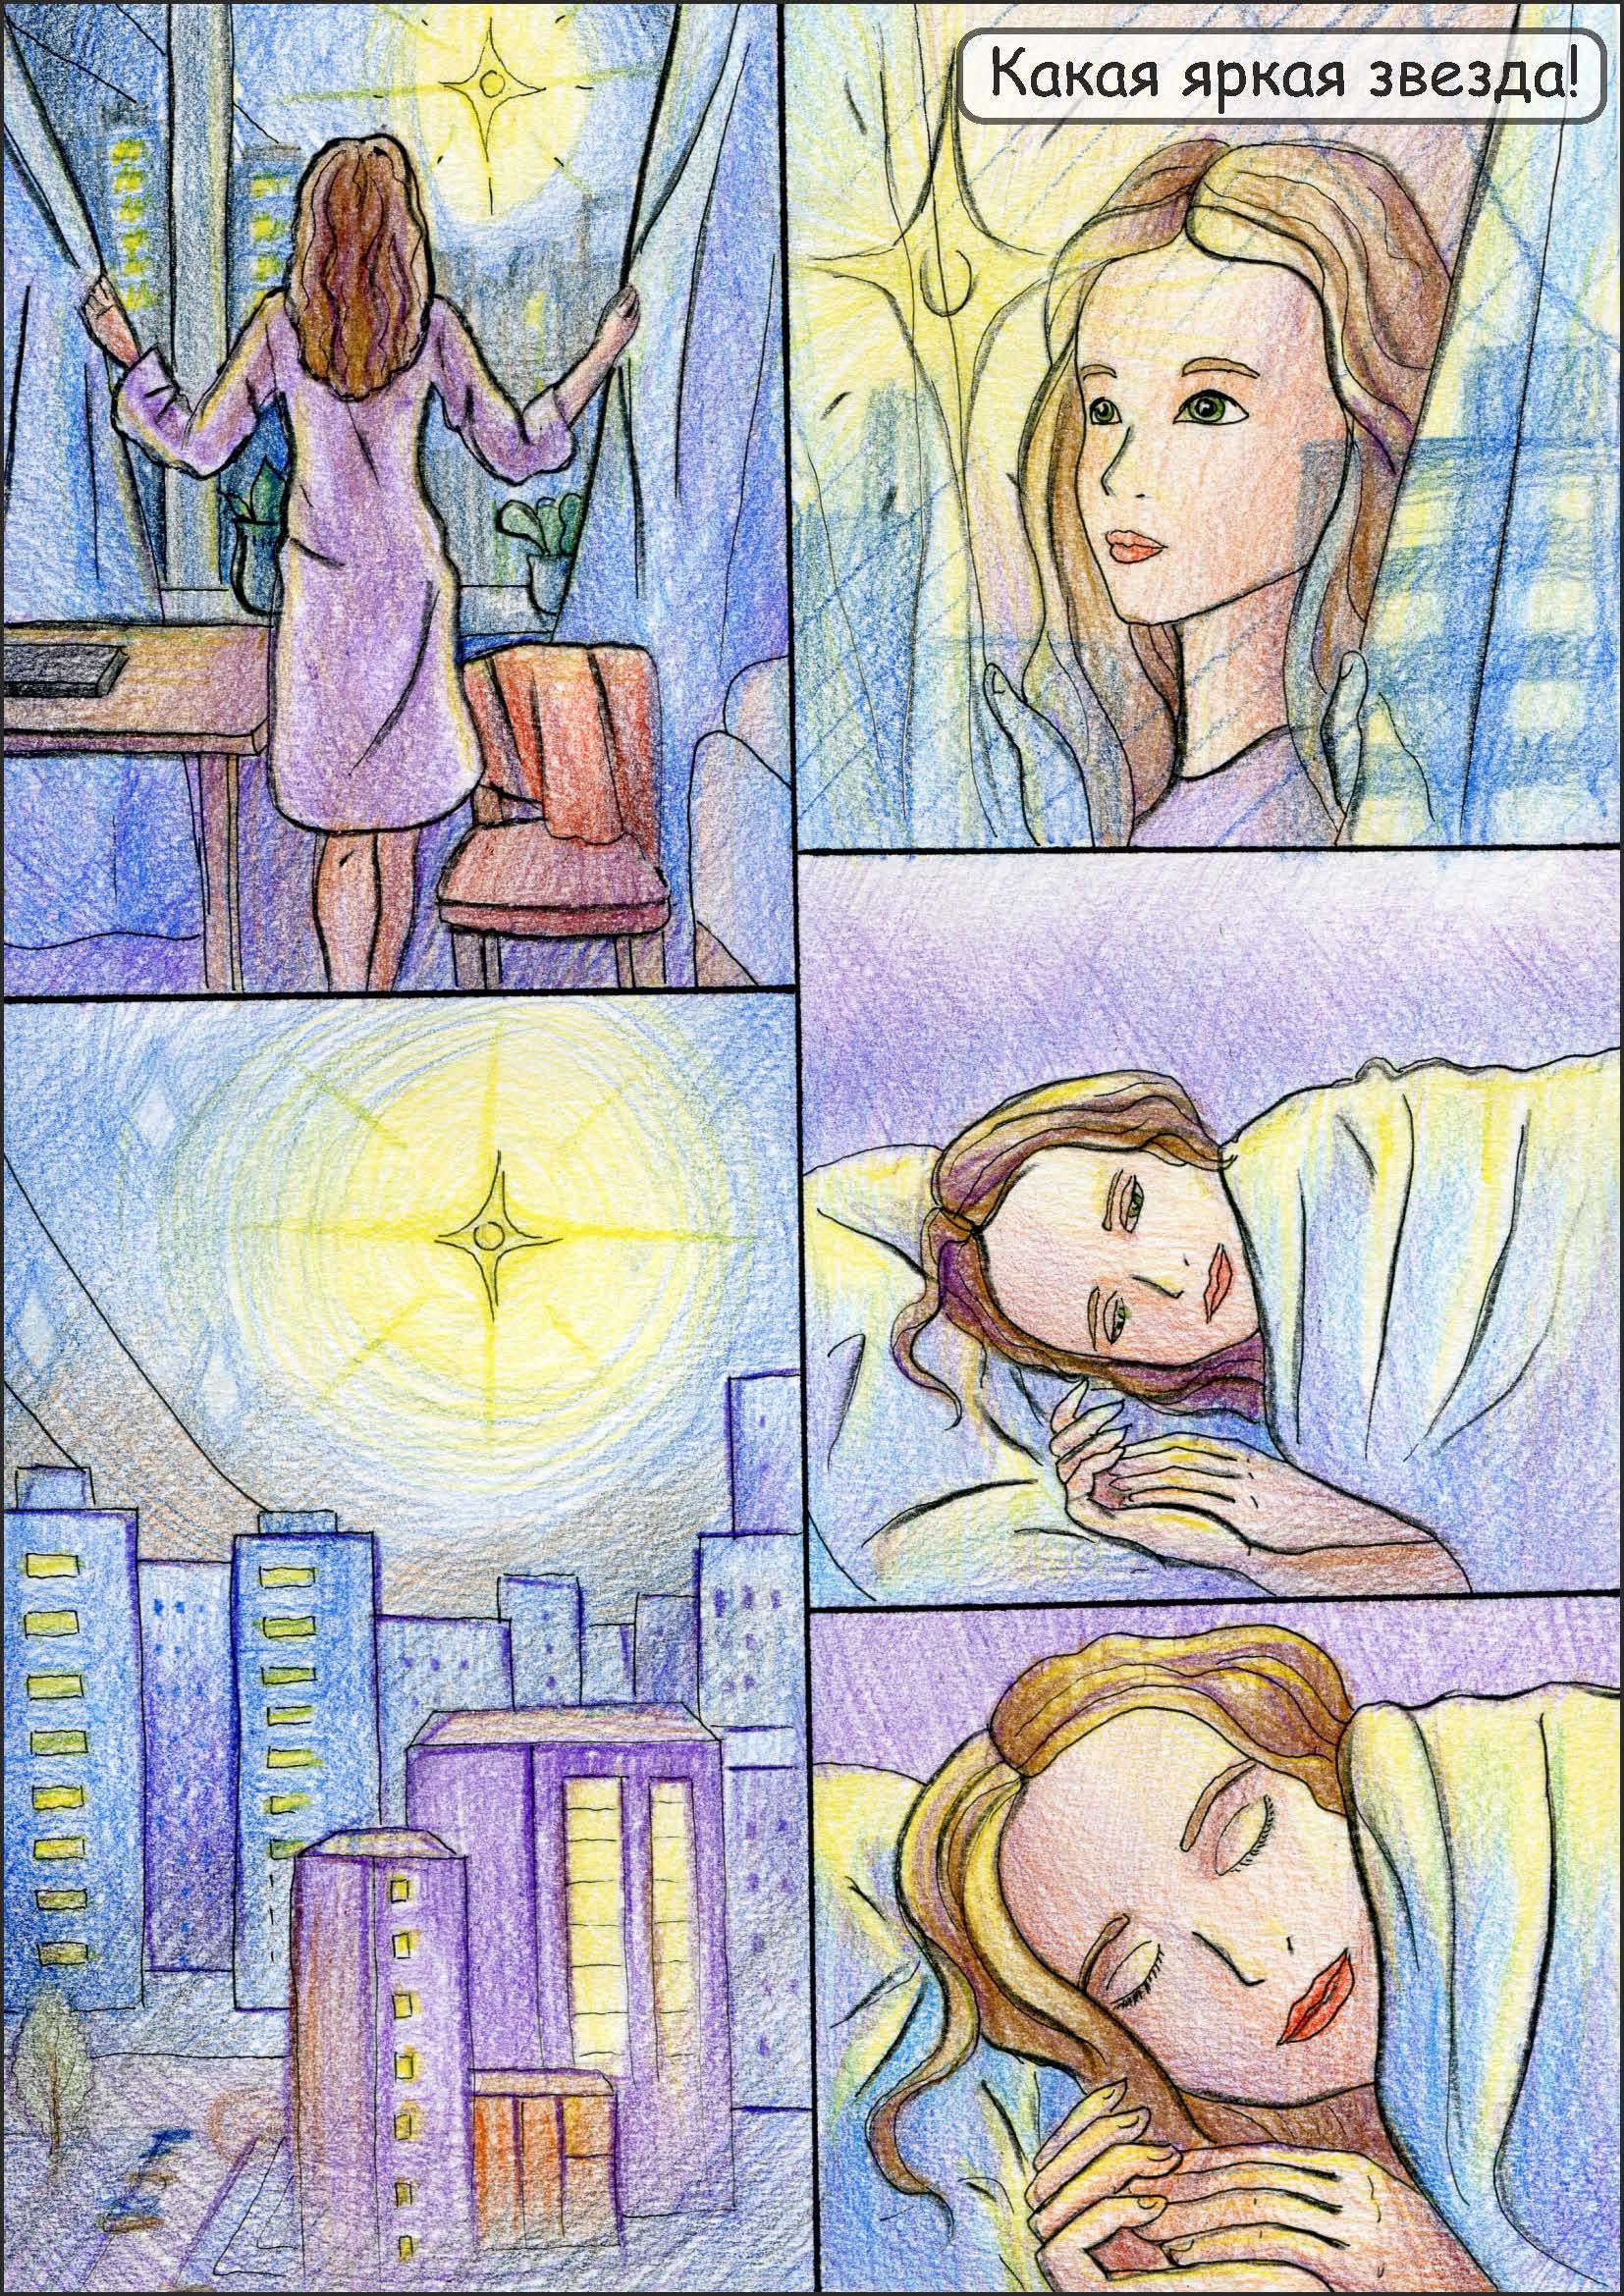 Анна Гейдебрехт. Комикс Зовущая мечта (8).jpg